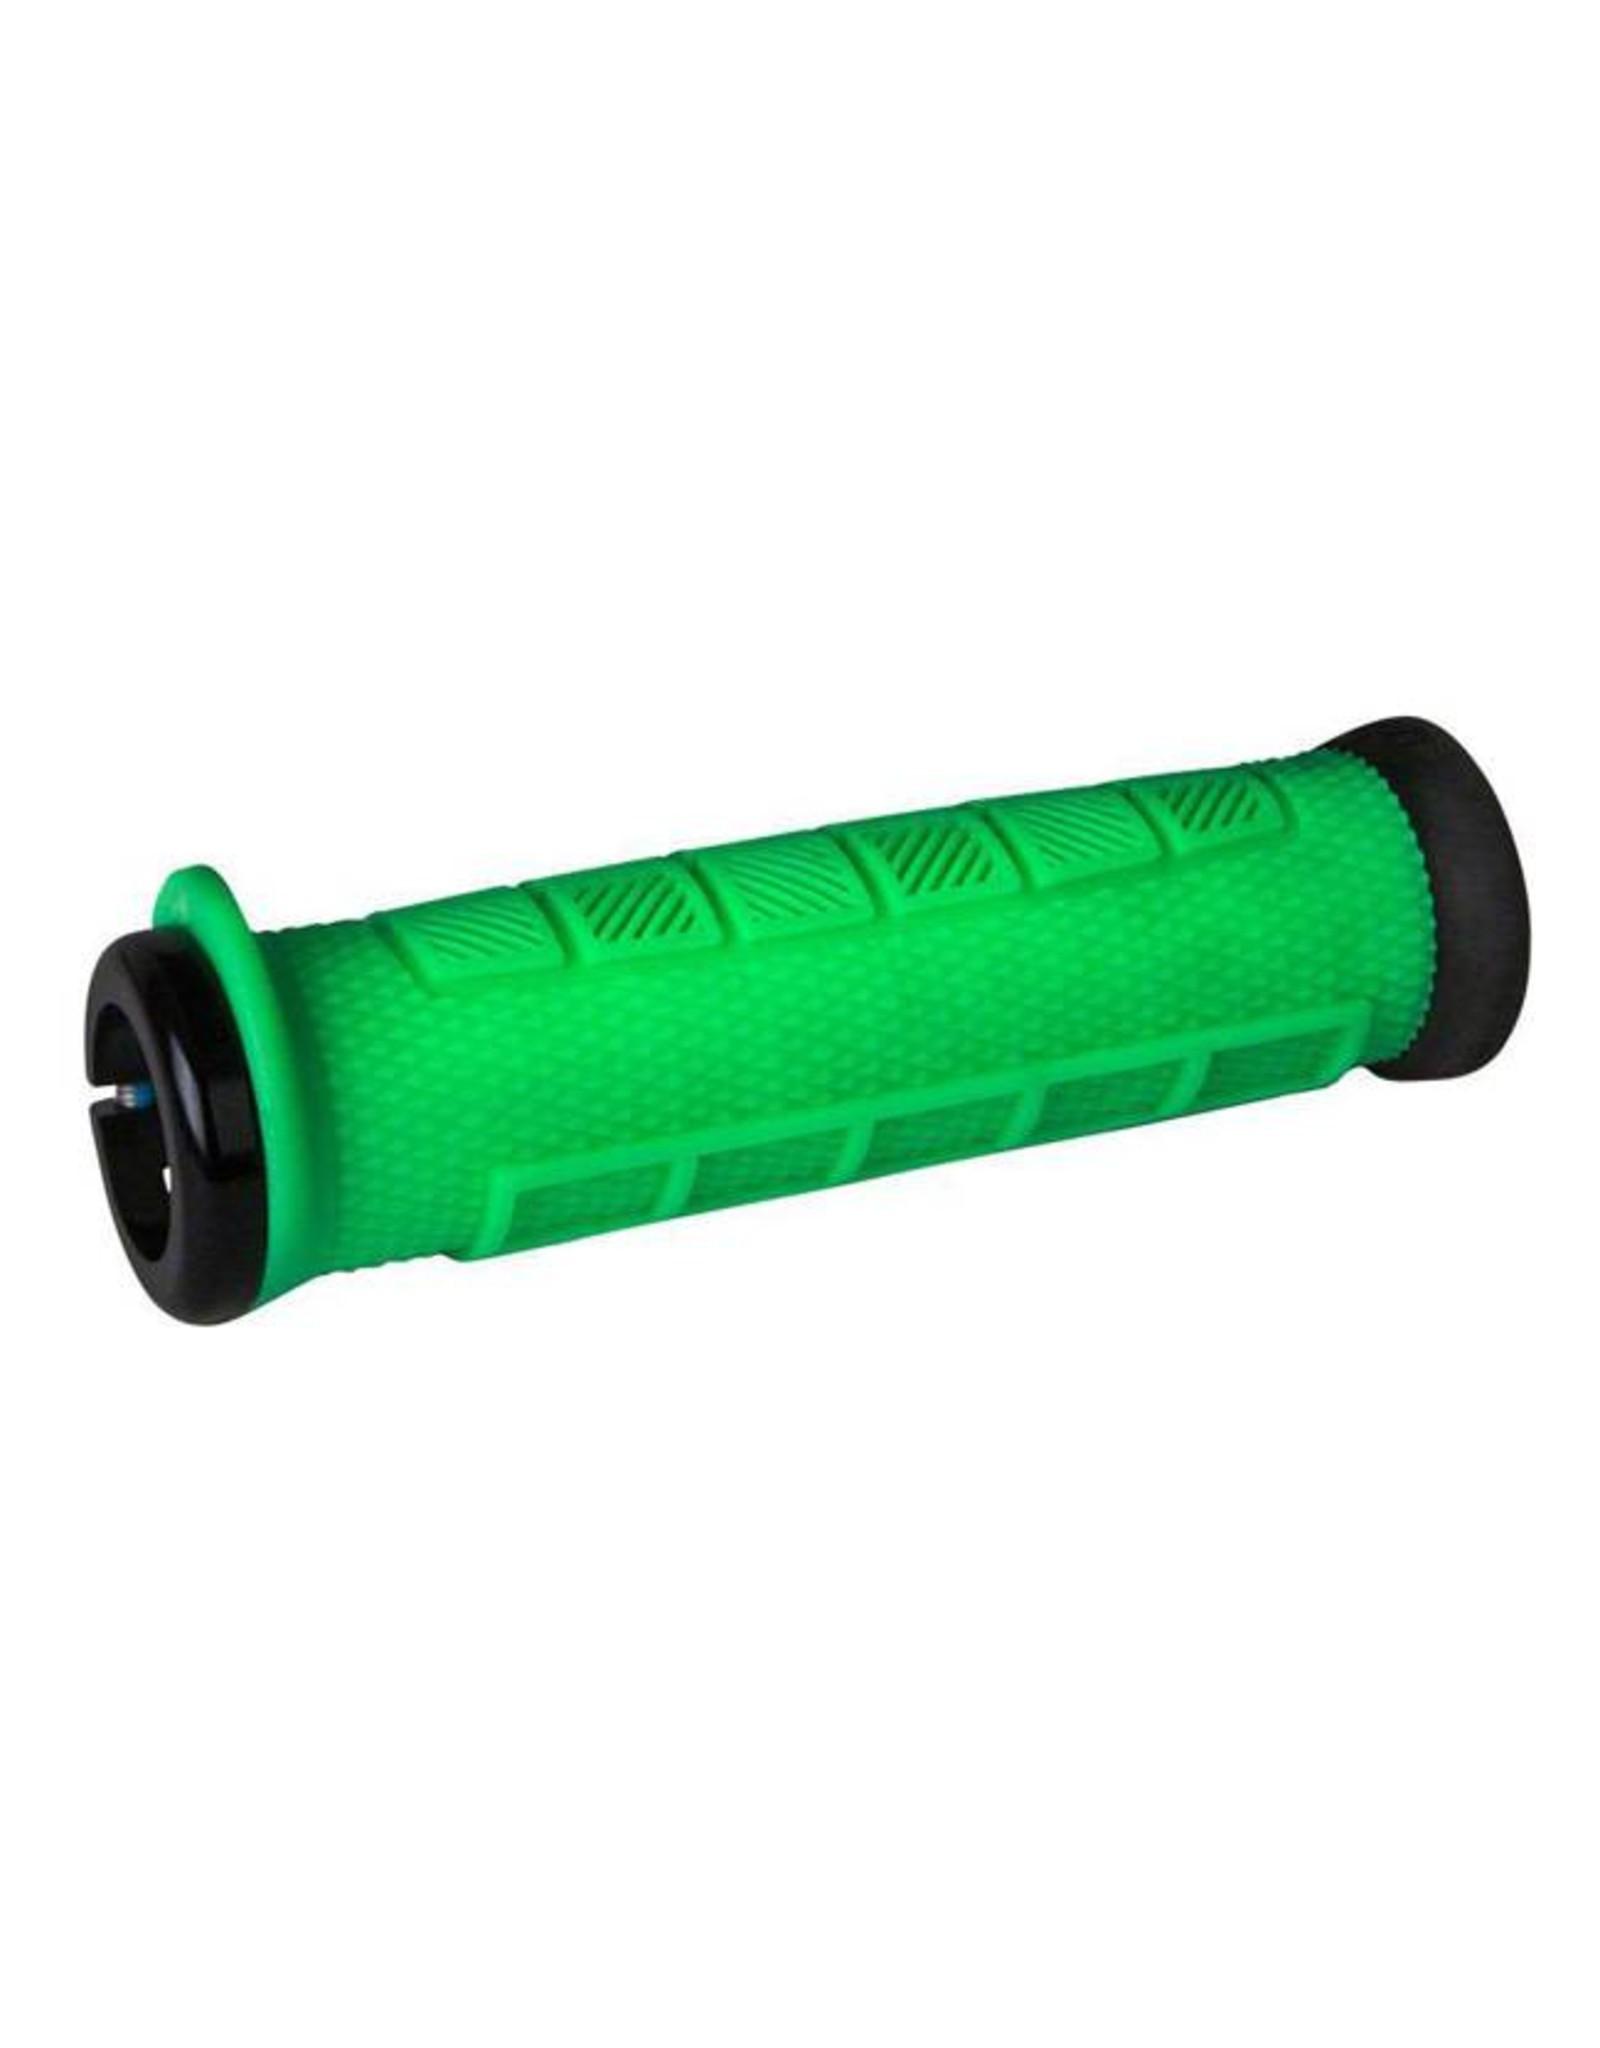 ODI ODI Elite Pro Lock-On Grips Retro Green with Black Clamps